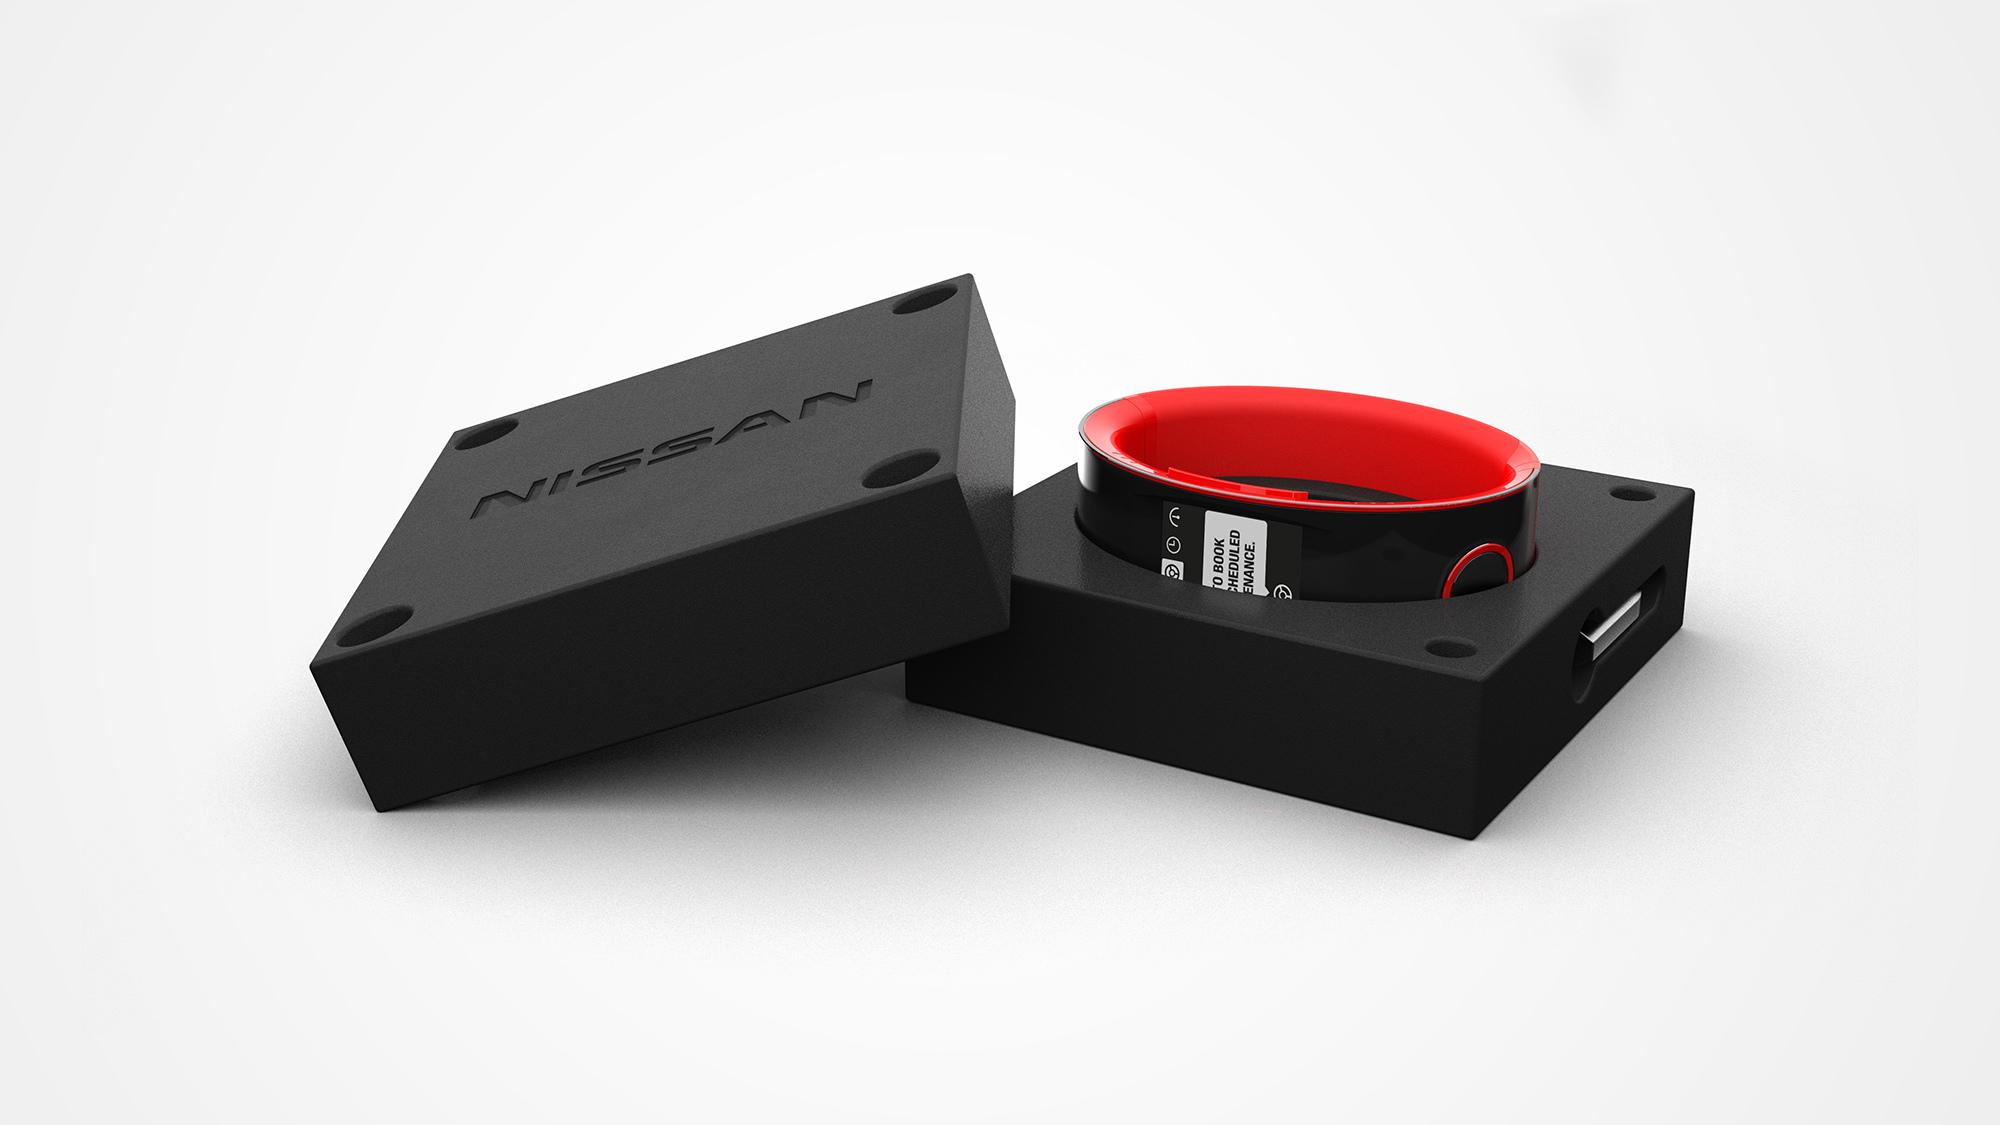 Nissan NISMO Smart Watch